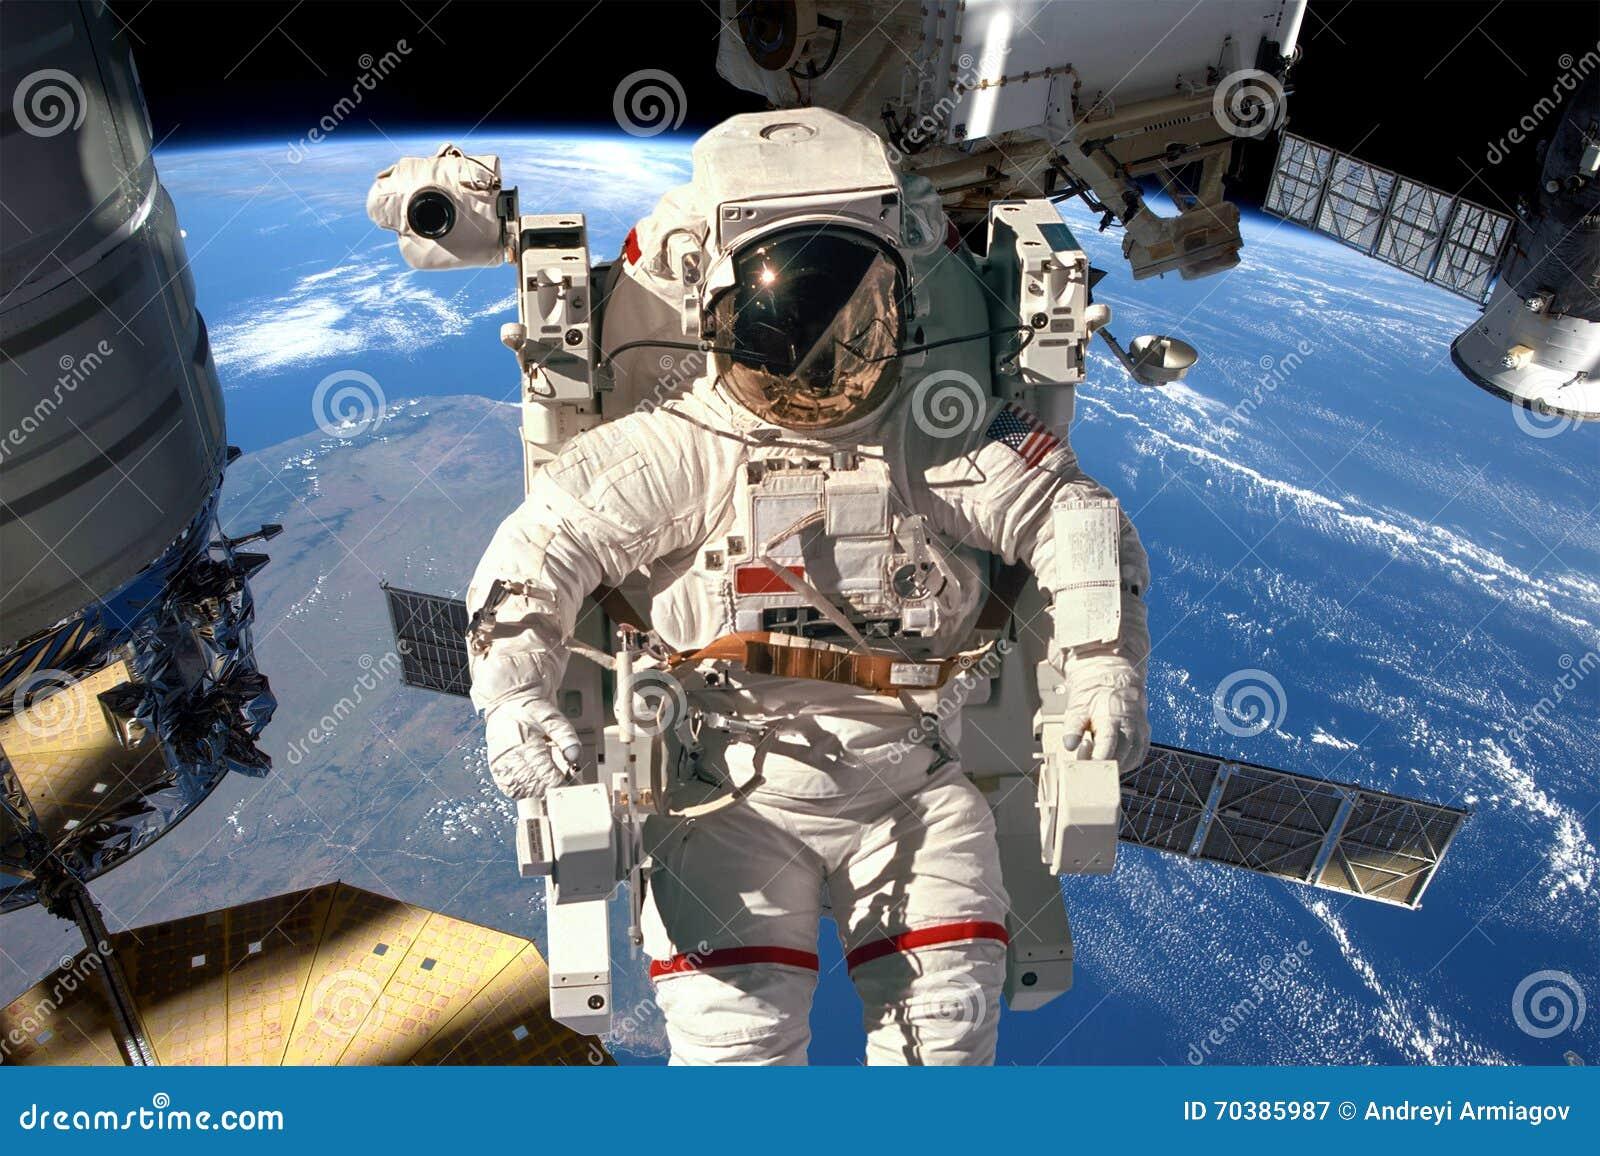 astronaut in the spacecraft - photo #12